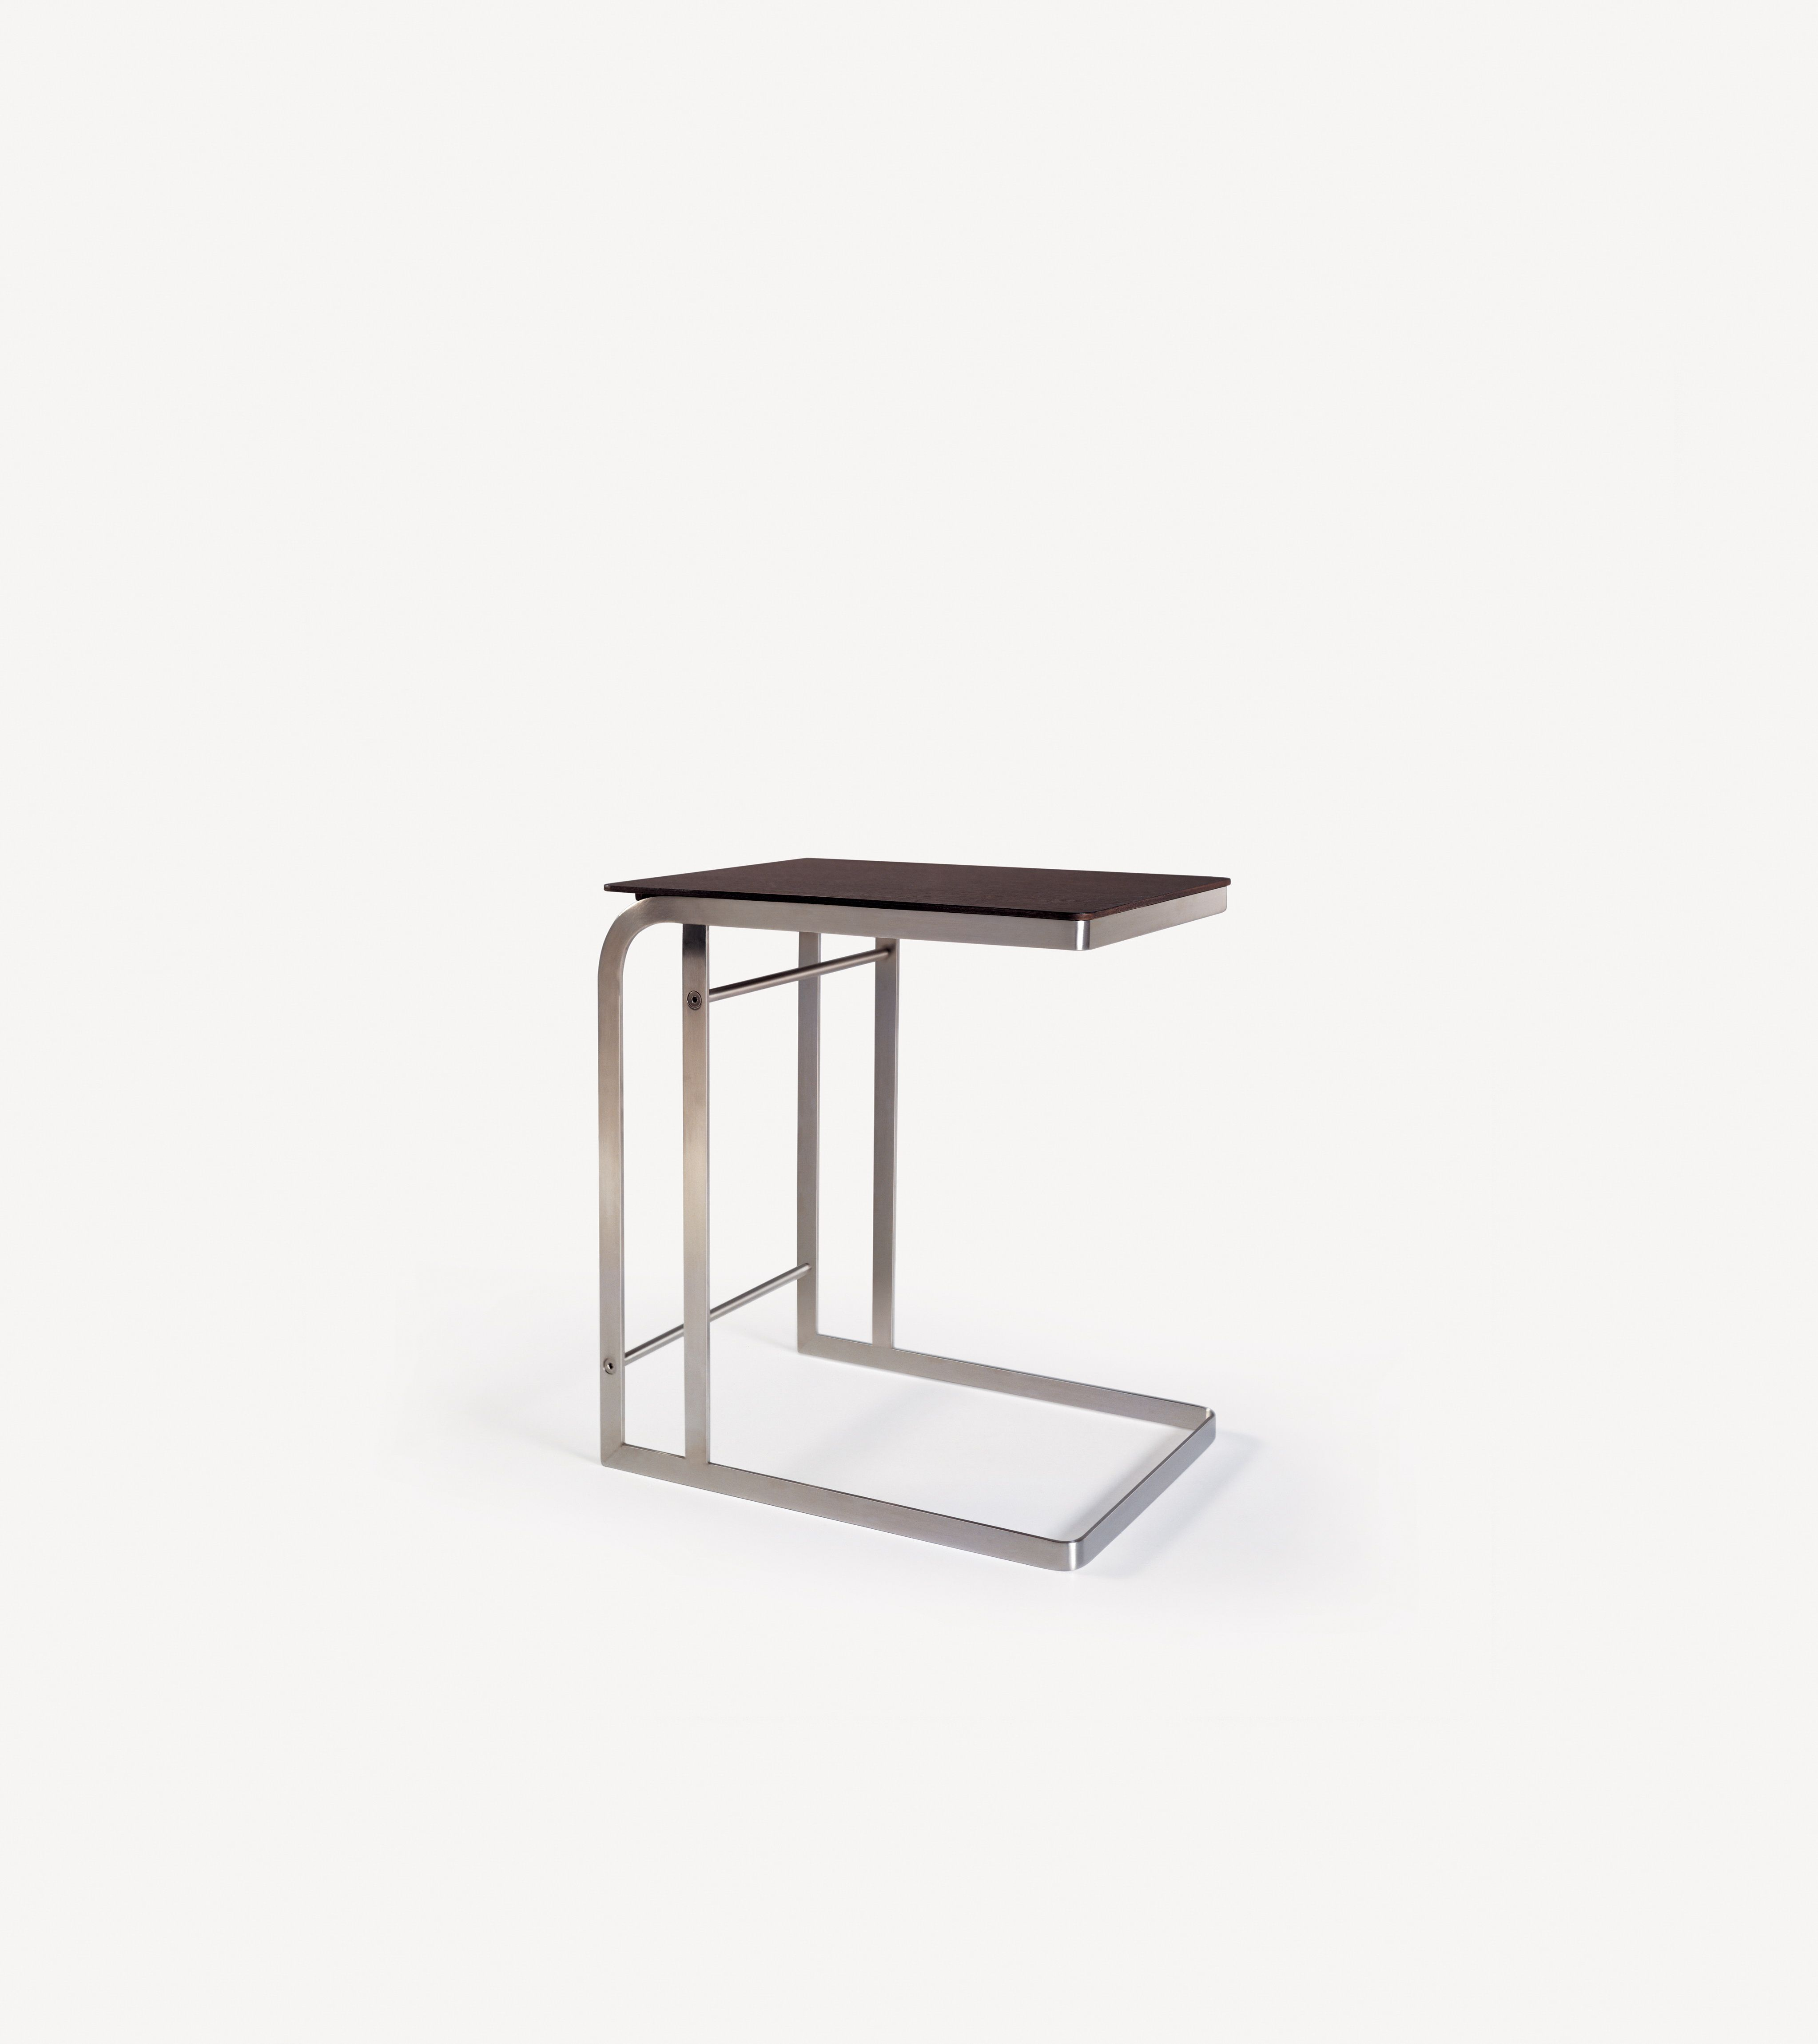 Slide under your sofa for instant gratification, Flexform Carlotta Break style side table.